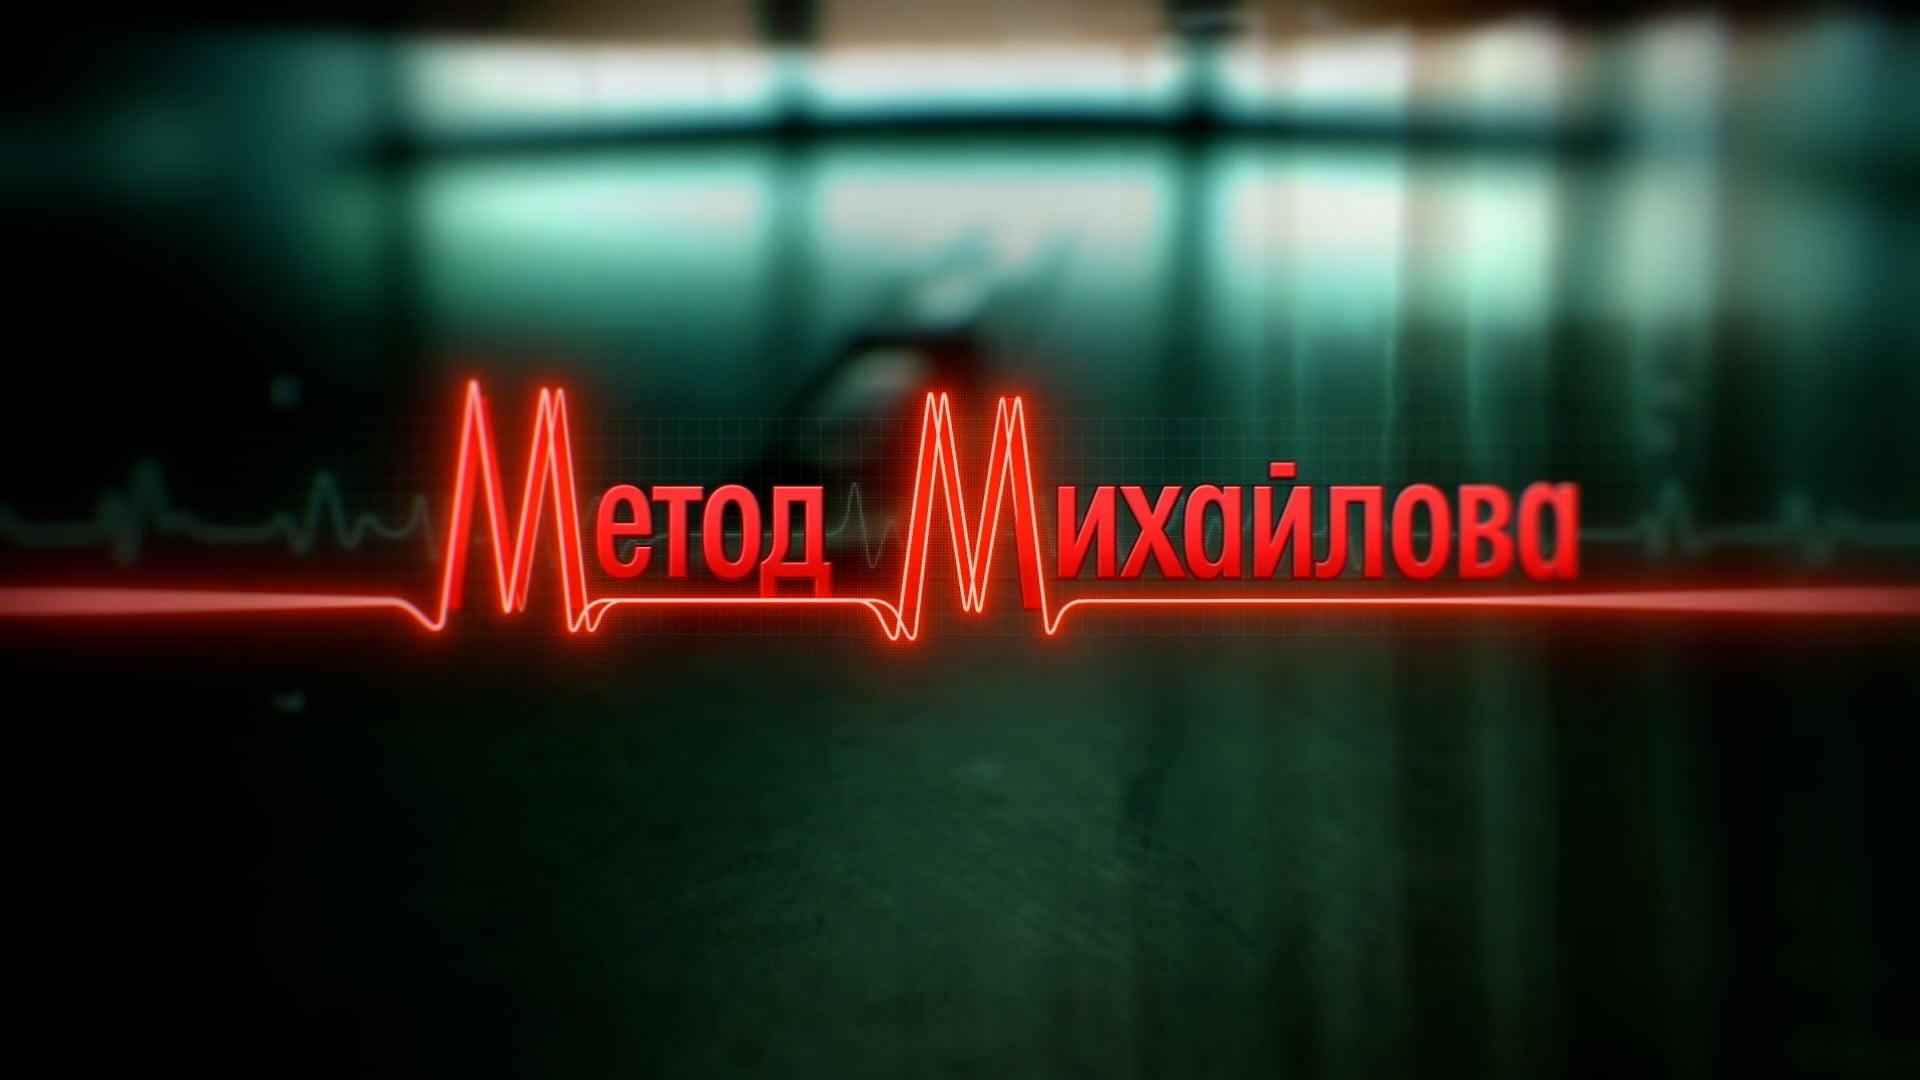 Mikhailov's Method main title sequence